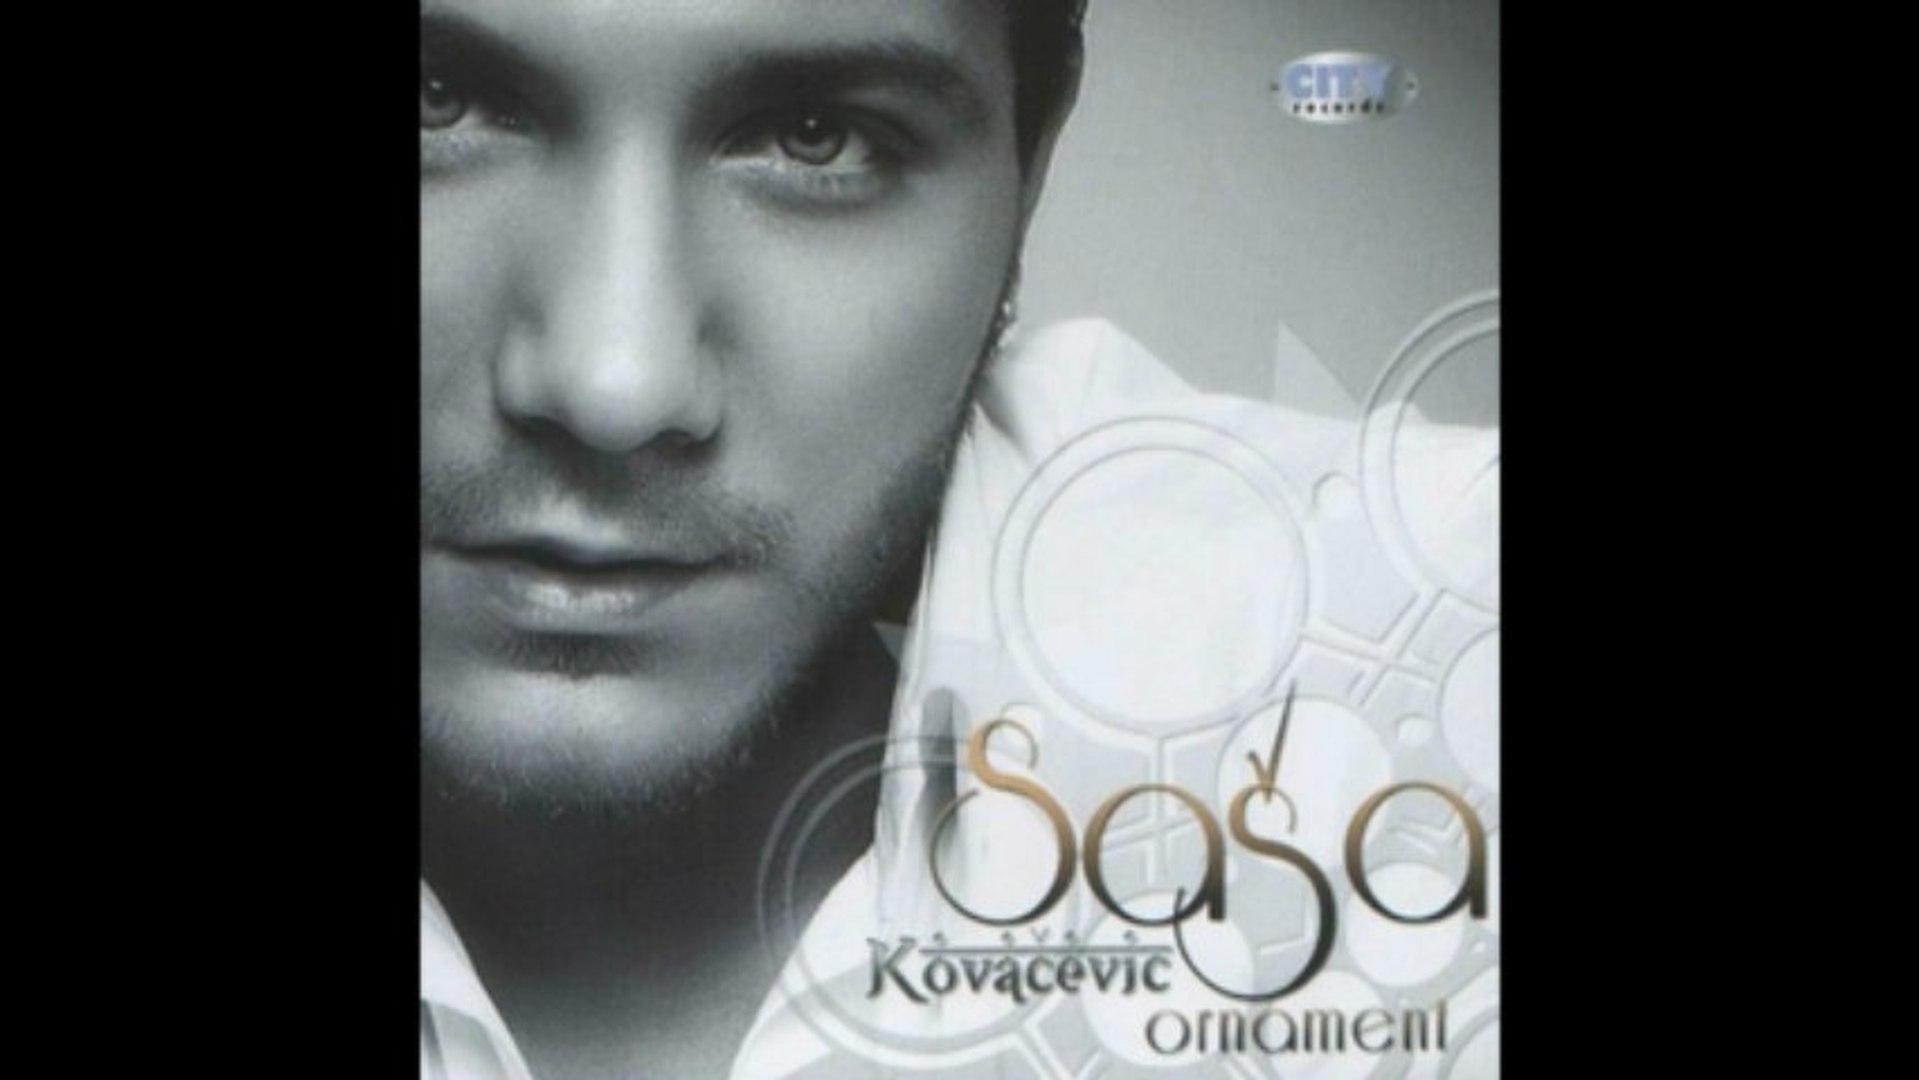 Sasa Kovacevic - Kako sada sam - (Audio 2010) HD